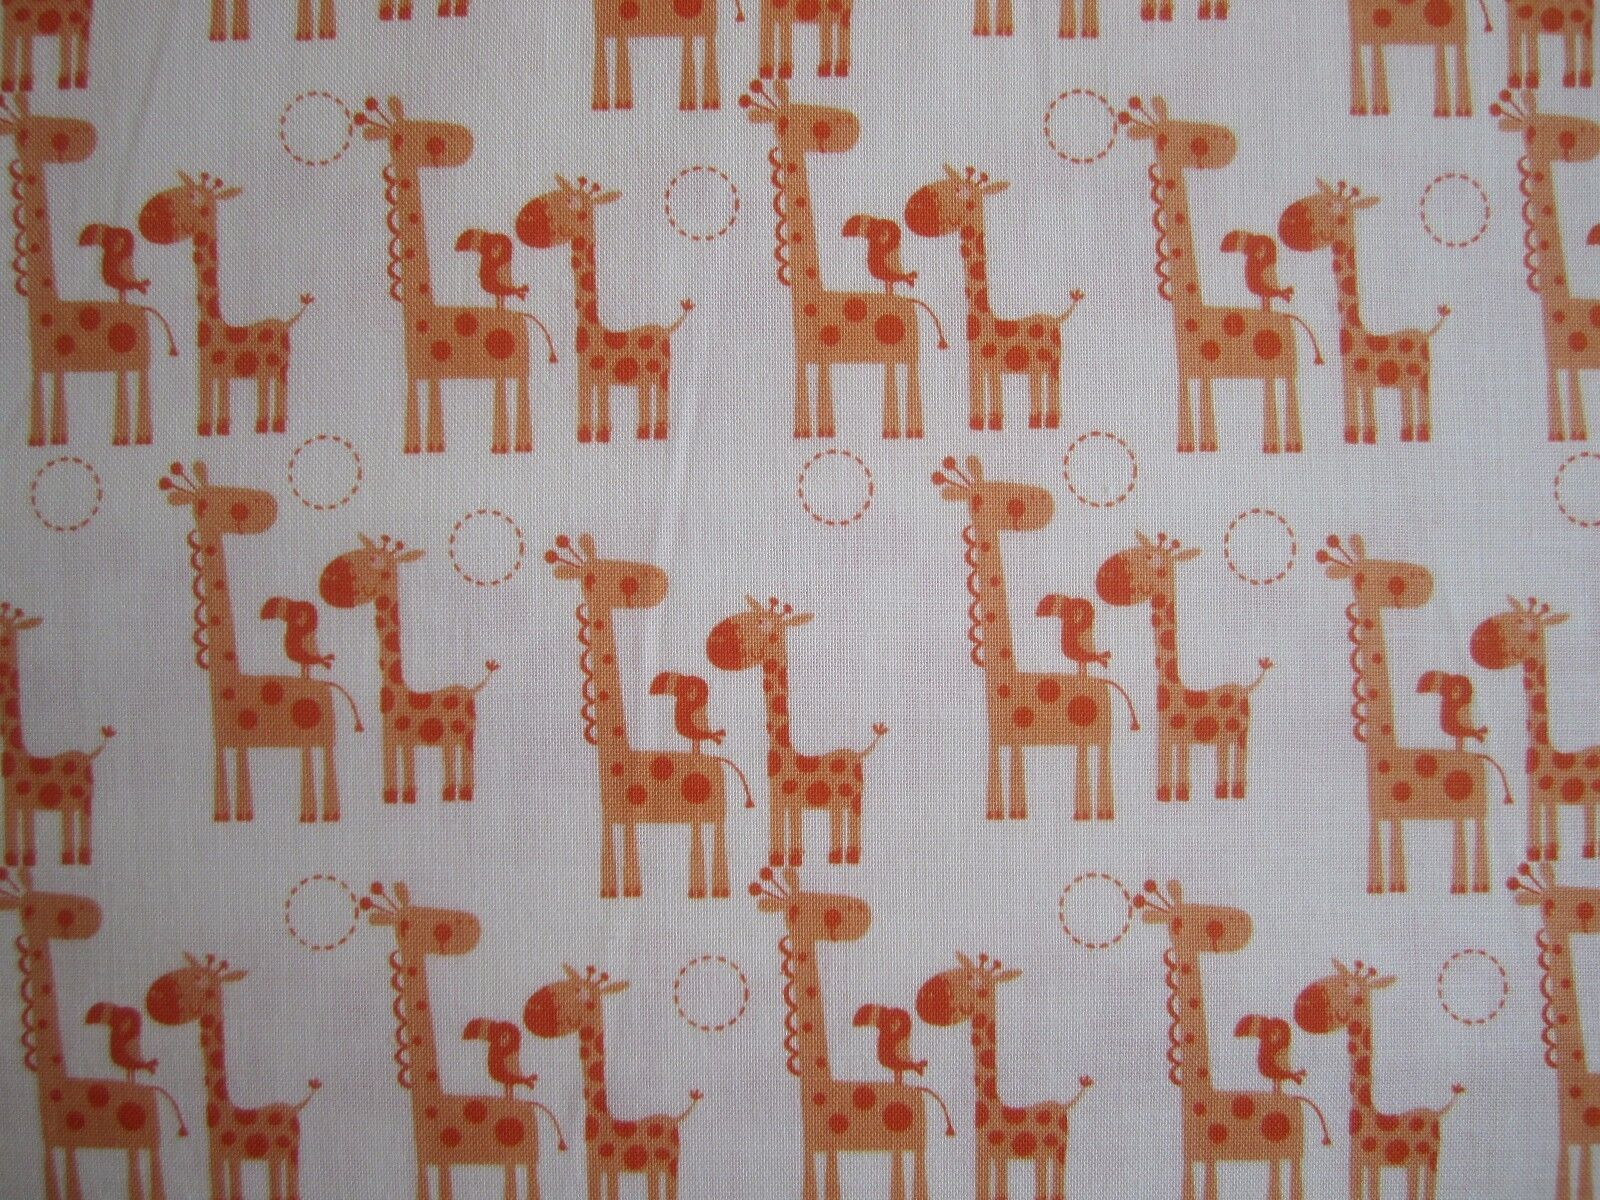 Orange Giraffes - 100% cotton fabric from 'Giraffe Crossing' by Riley Blake